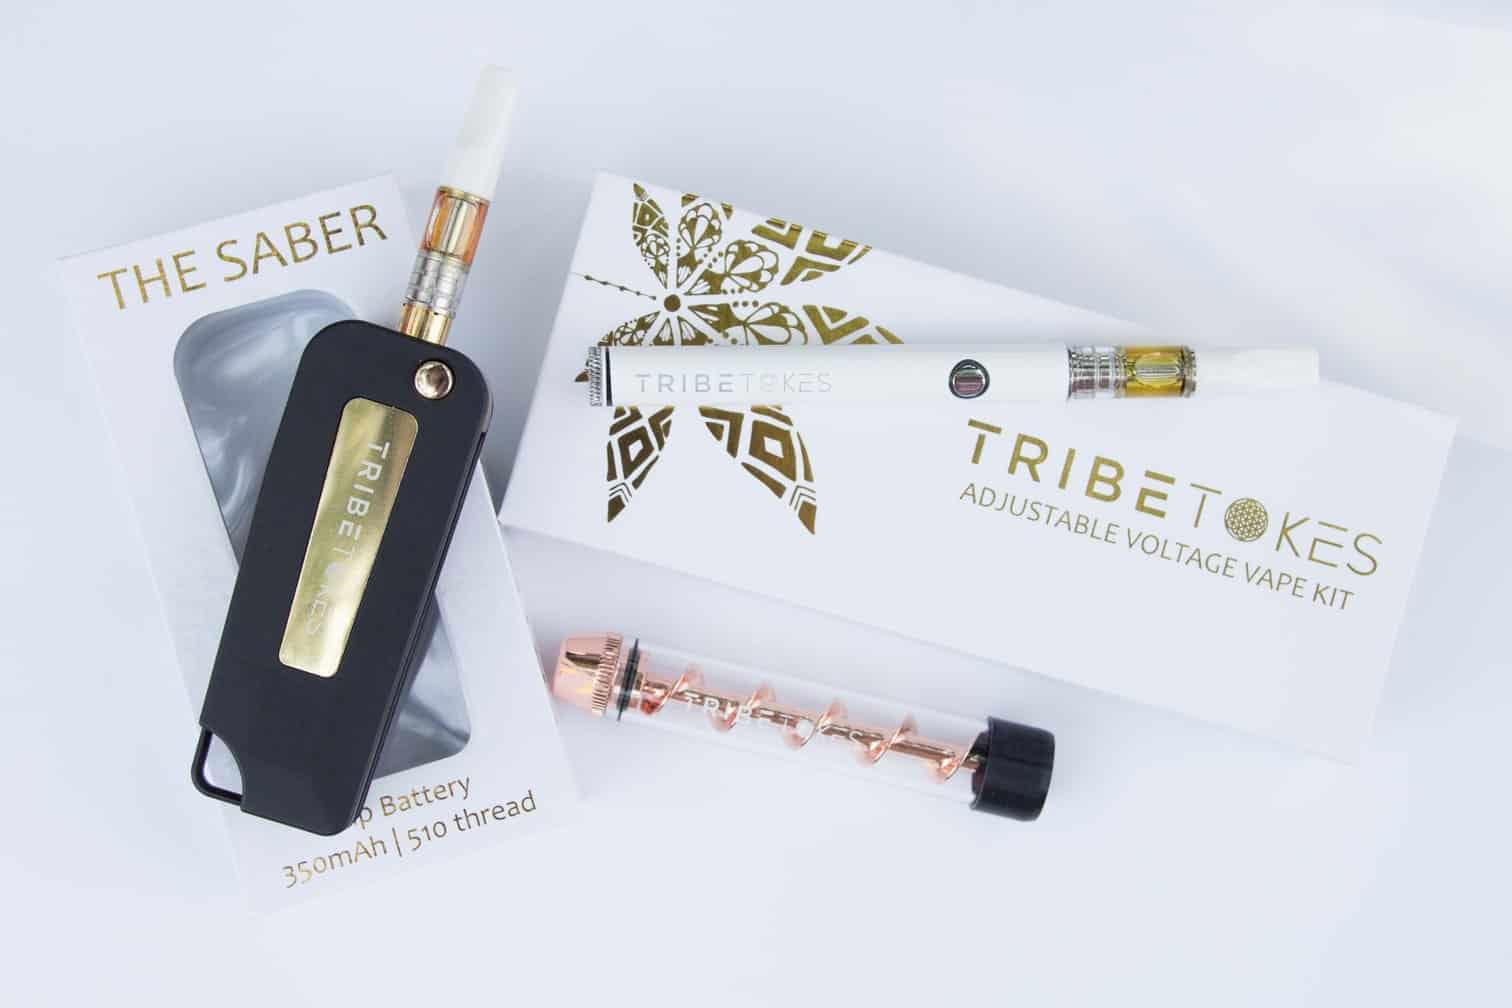 TribeTokes CBD Coupon Code discounts promos save on cannabis online Store1